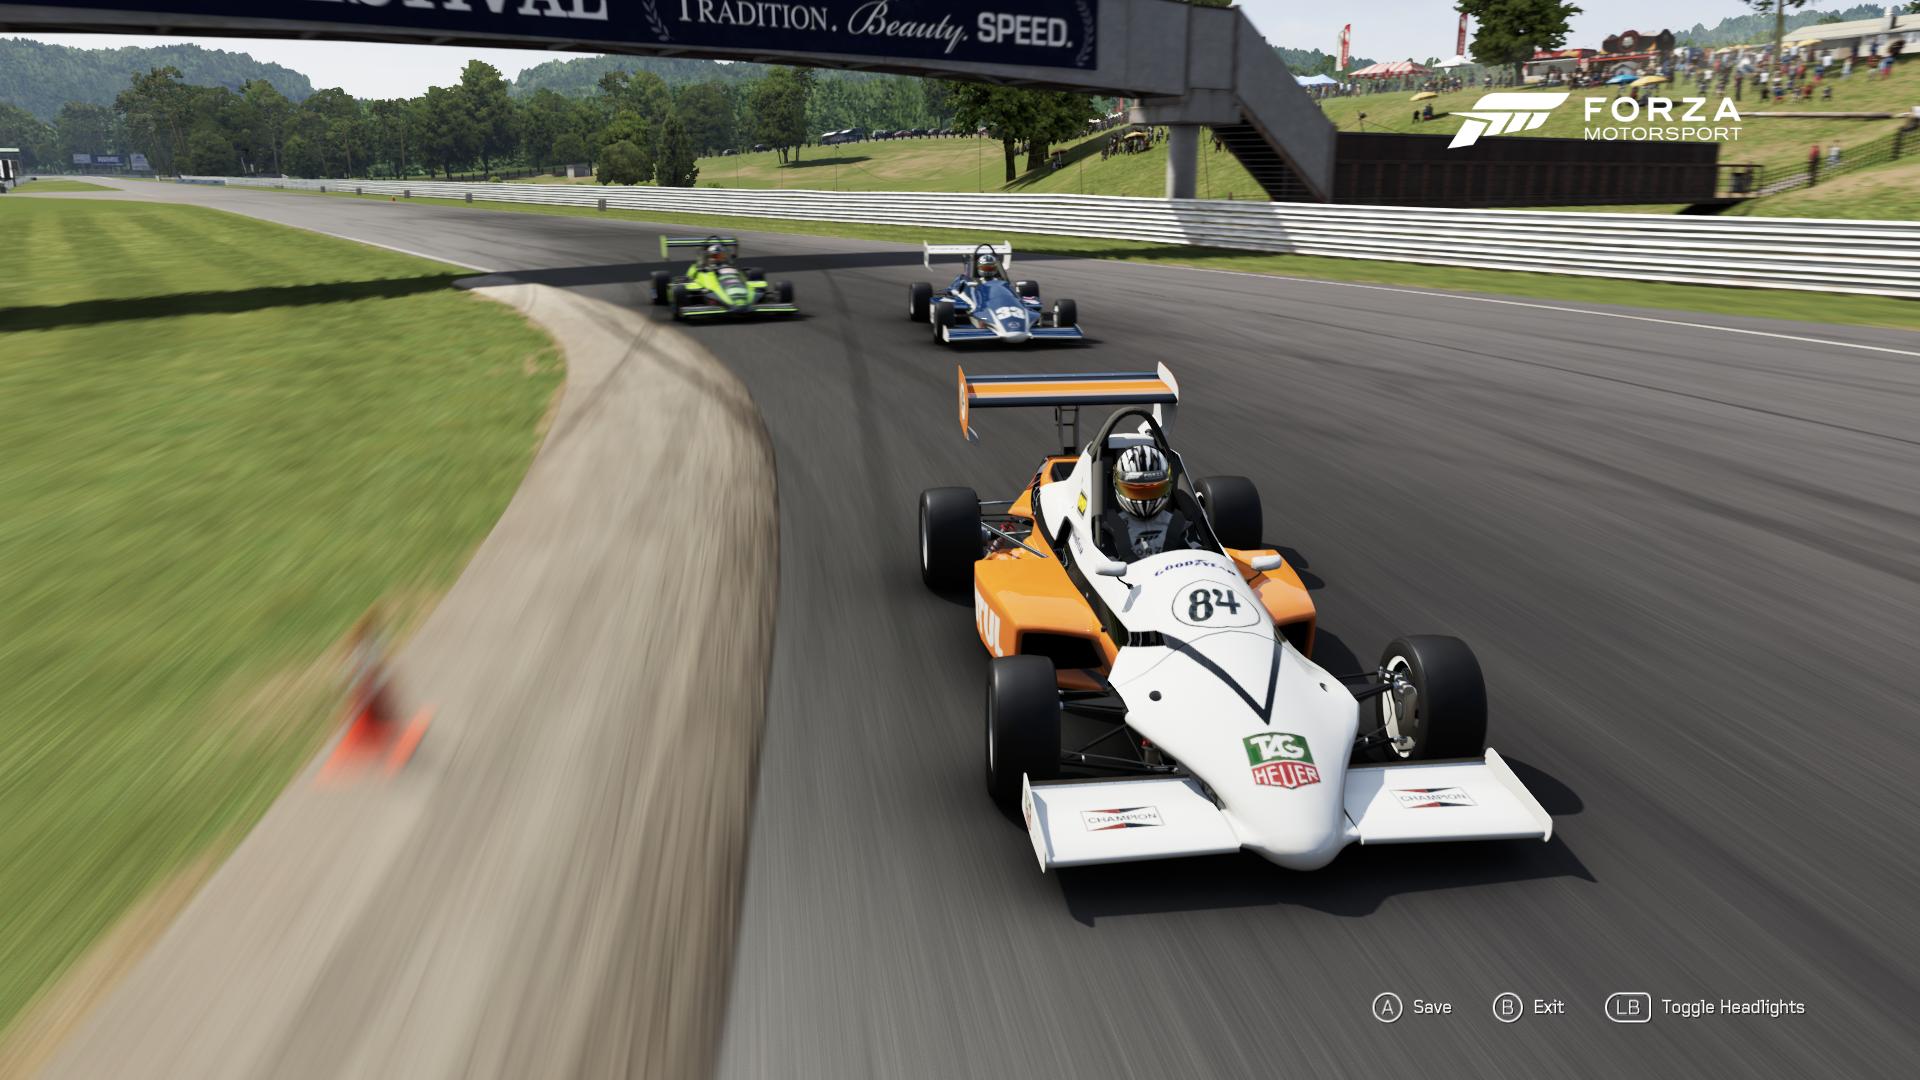 Formula Mazda Forza League OffTopic KartPulse Forums - Formula mazda